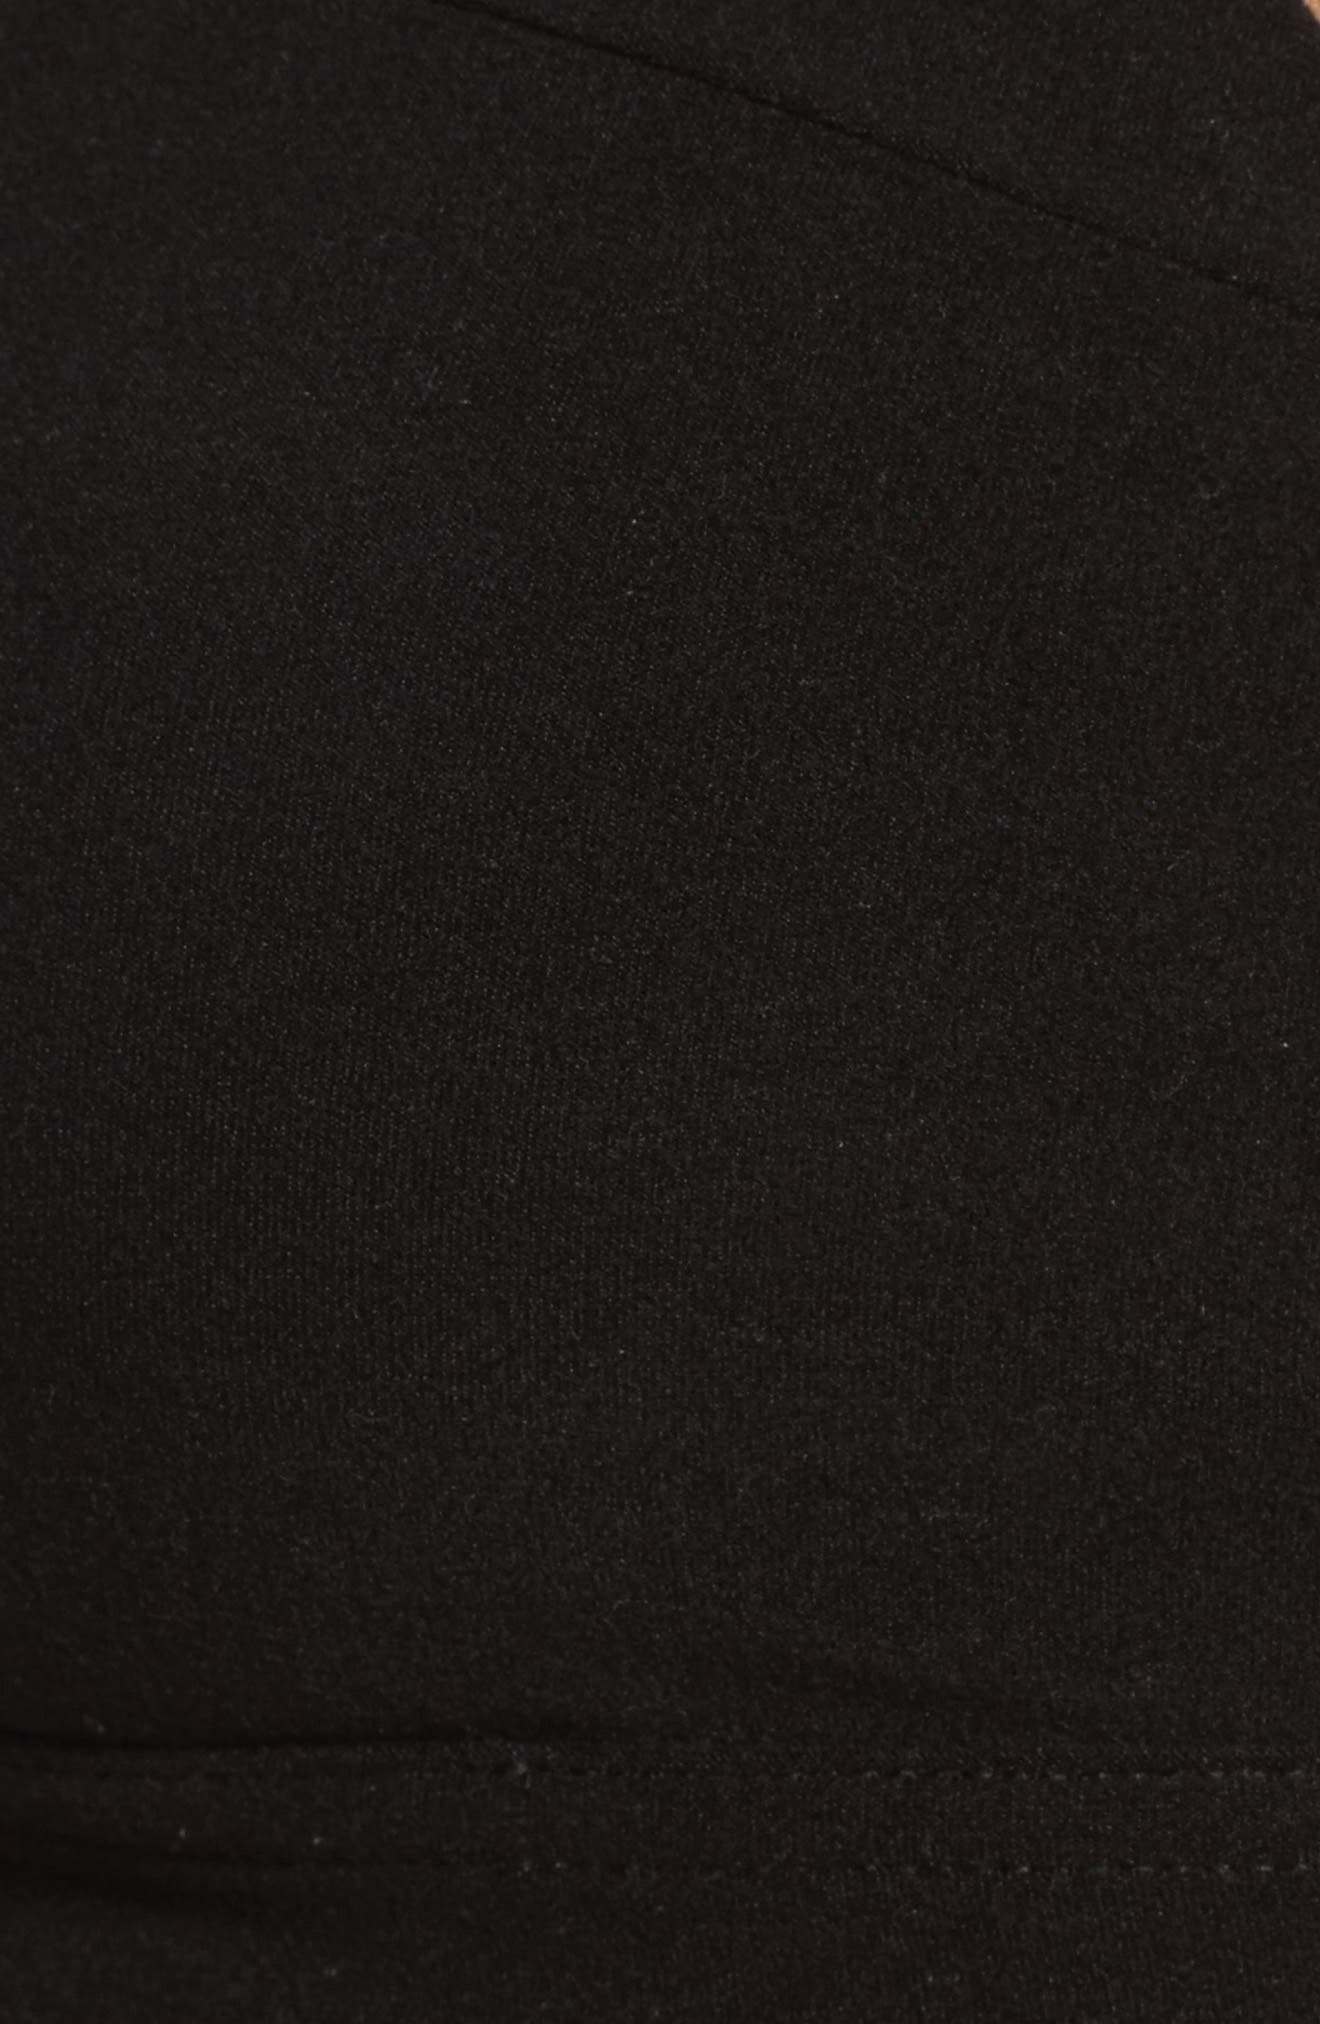 Lounge Sports Bra,                             Alternate thumbnail 6, color,                             Black